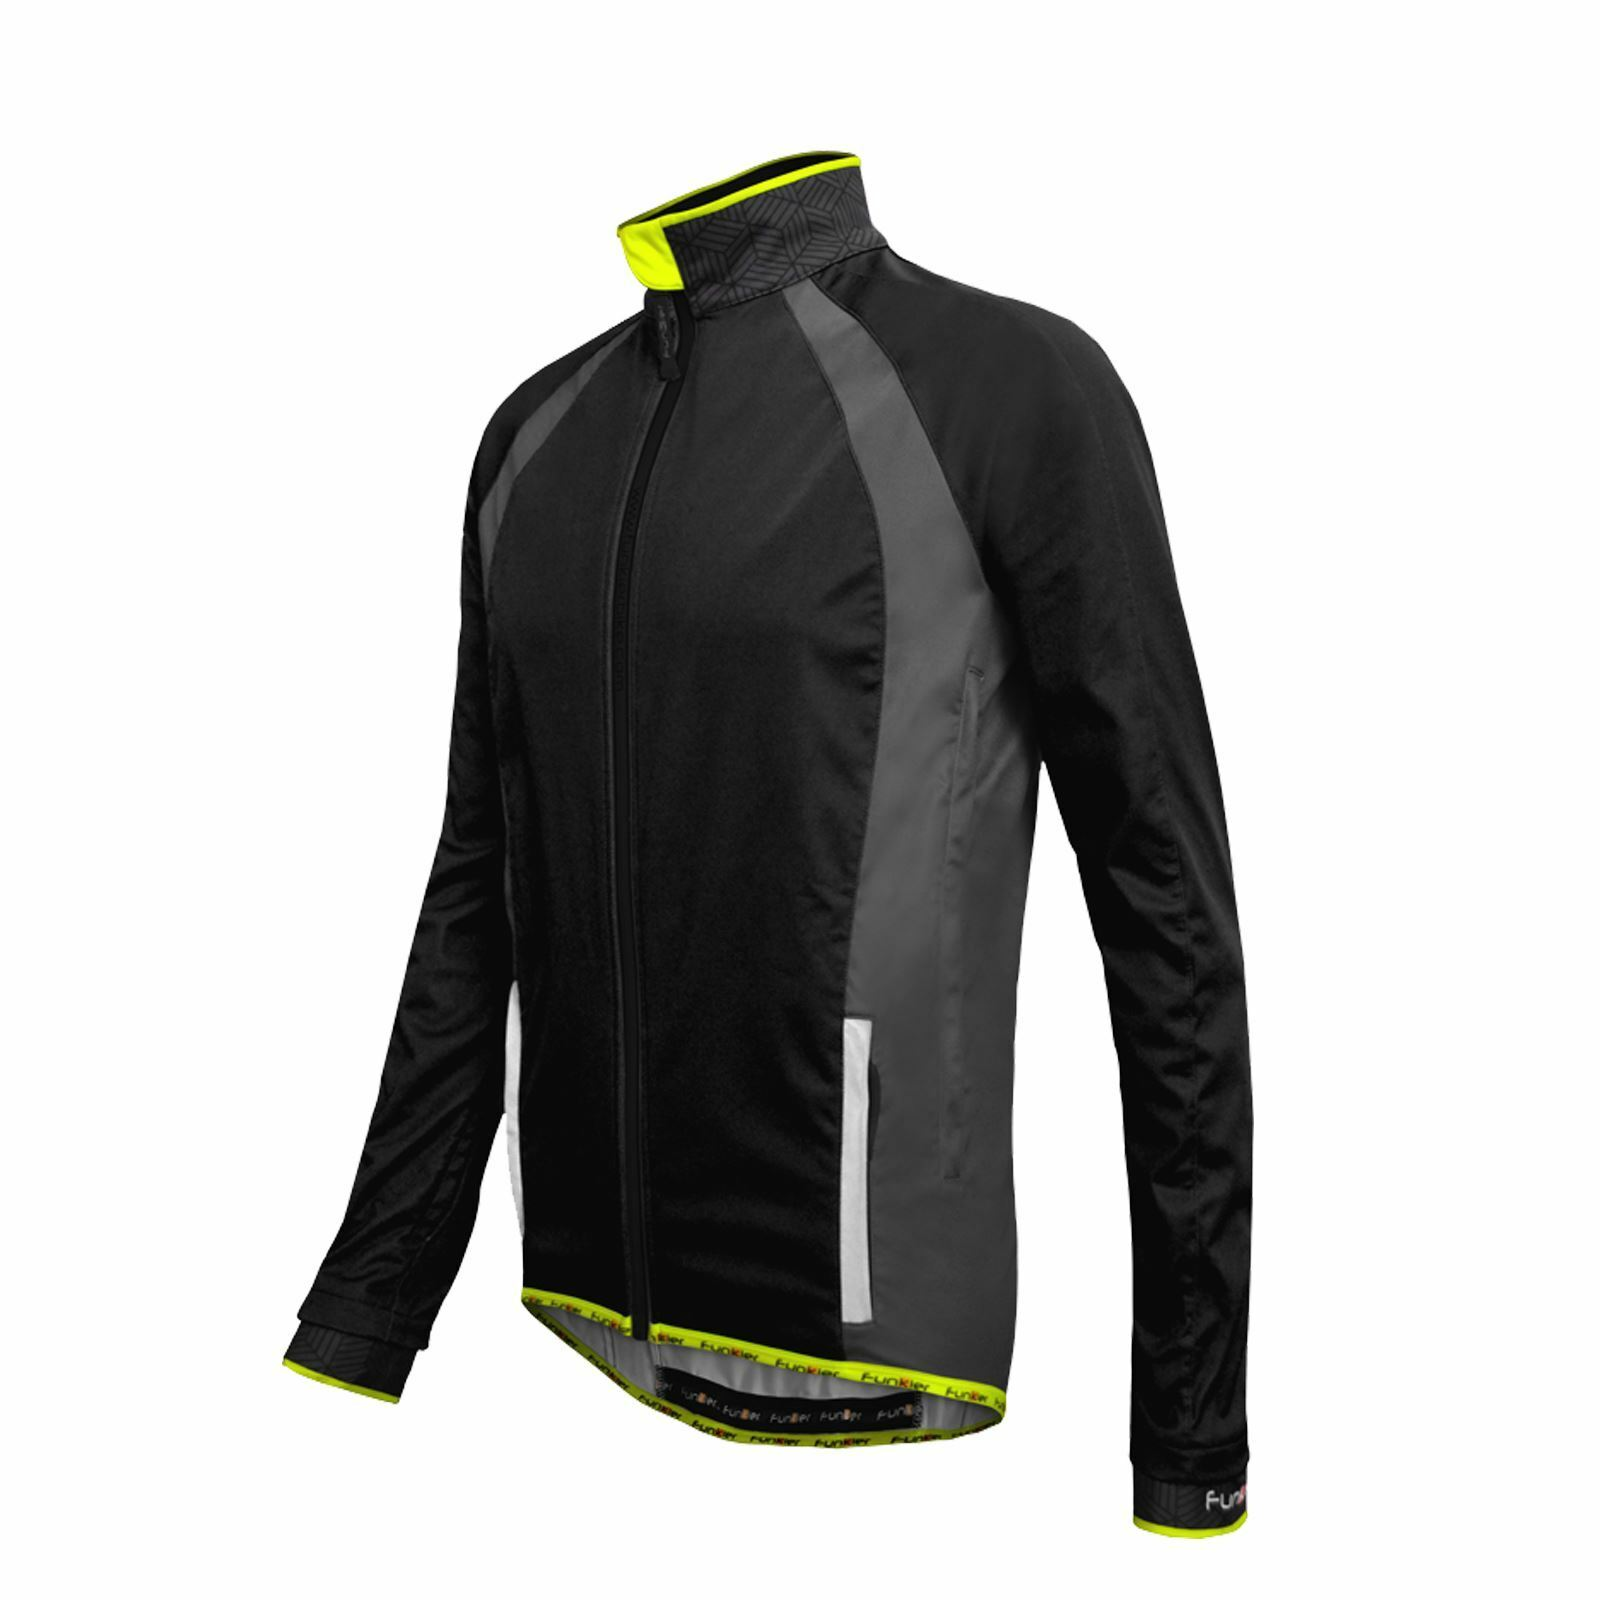 Chaqueta de ciclismo Funkier Tacona WJ-1323 Soft Shell Windstopper  Negro XXX-grande  80% de descuento